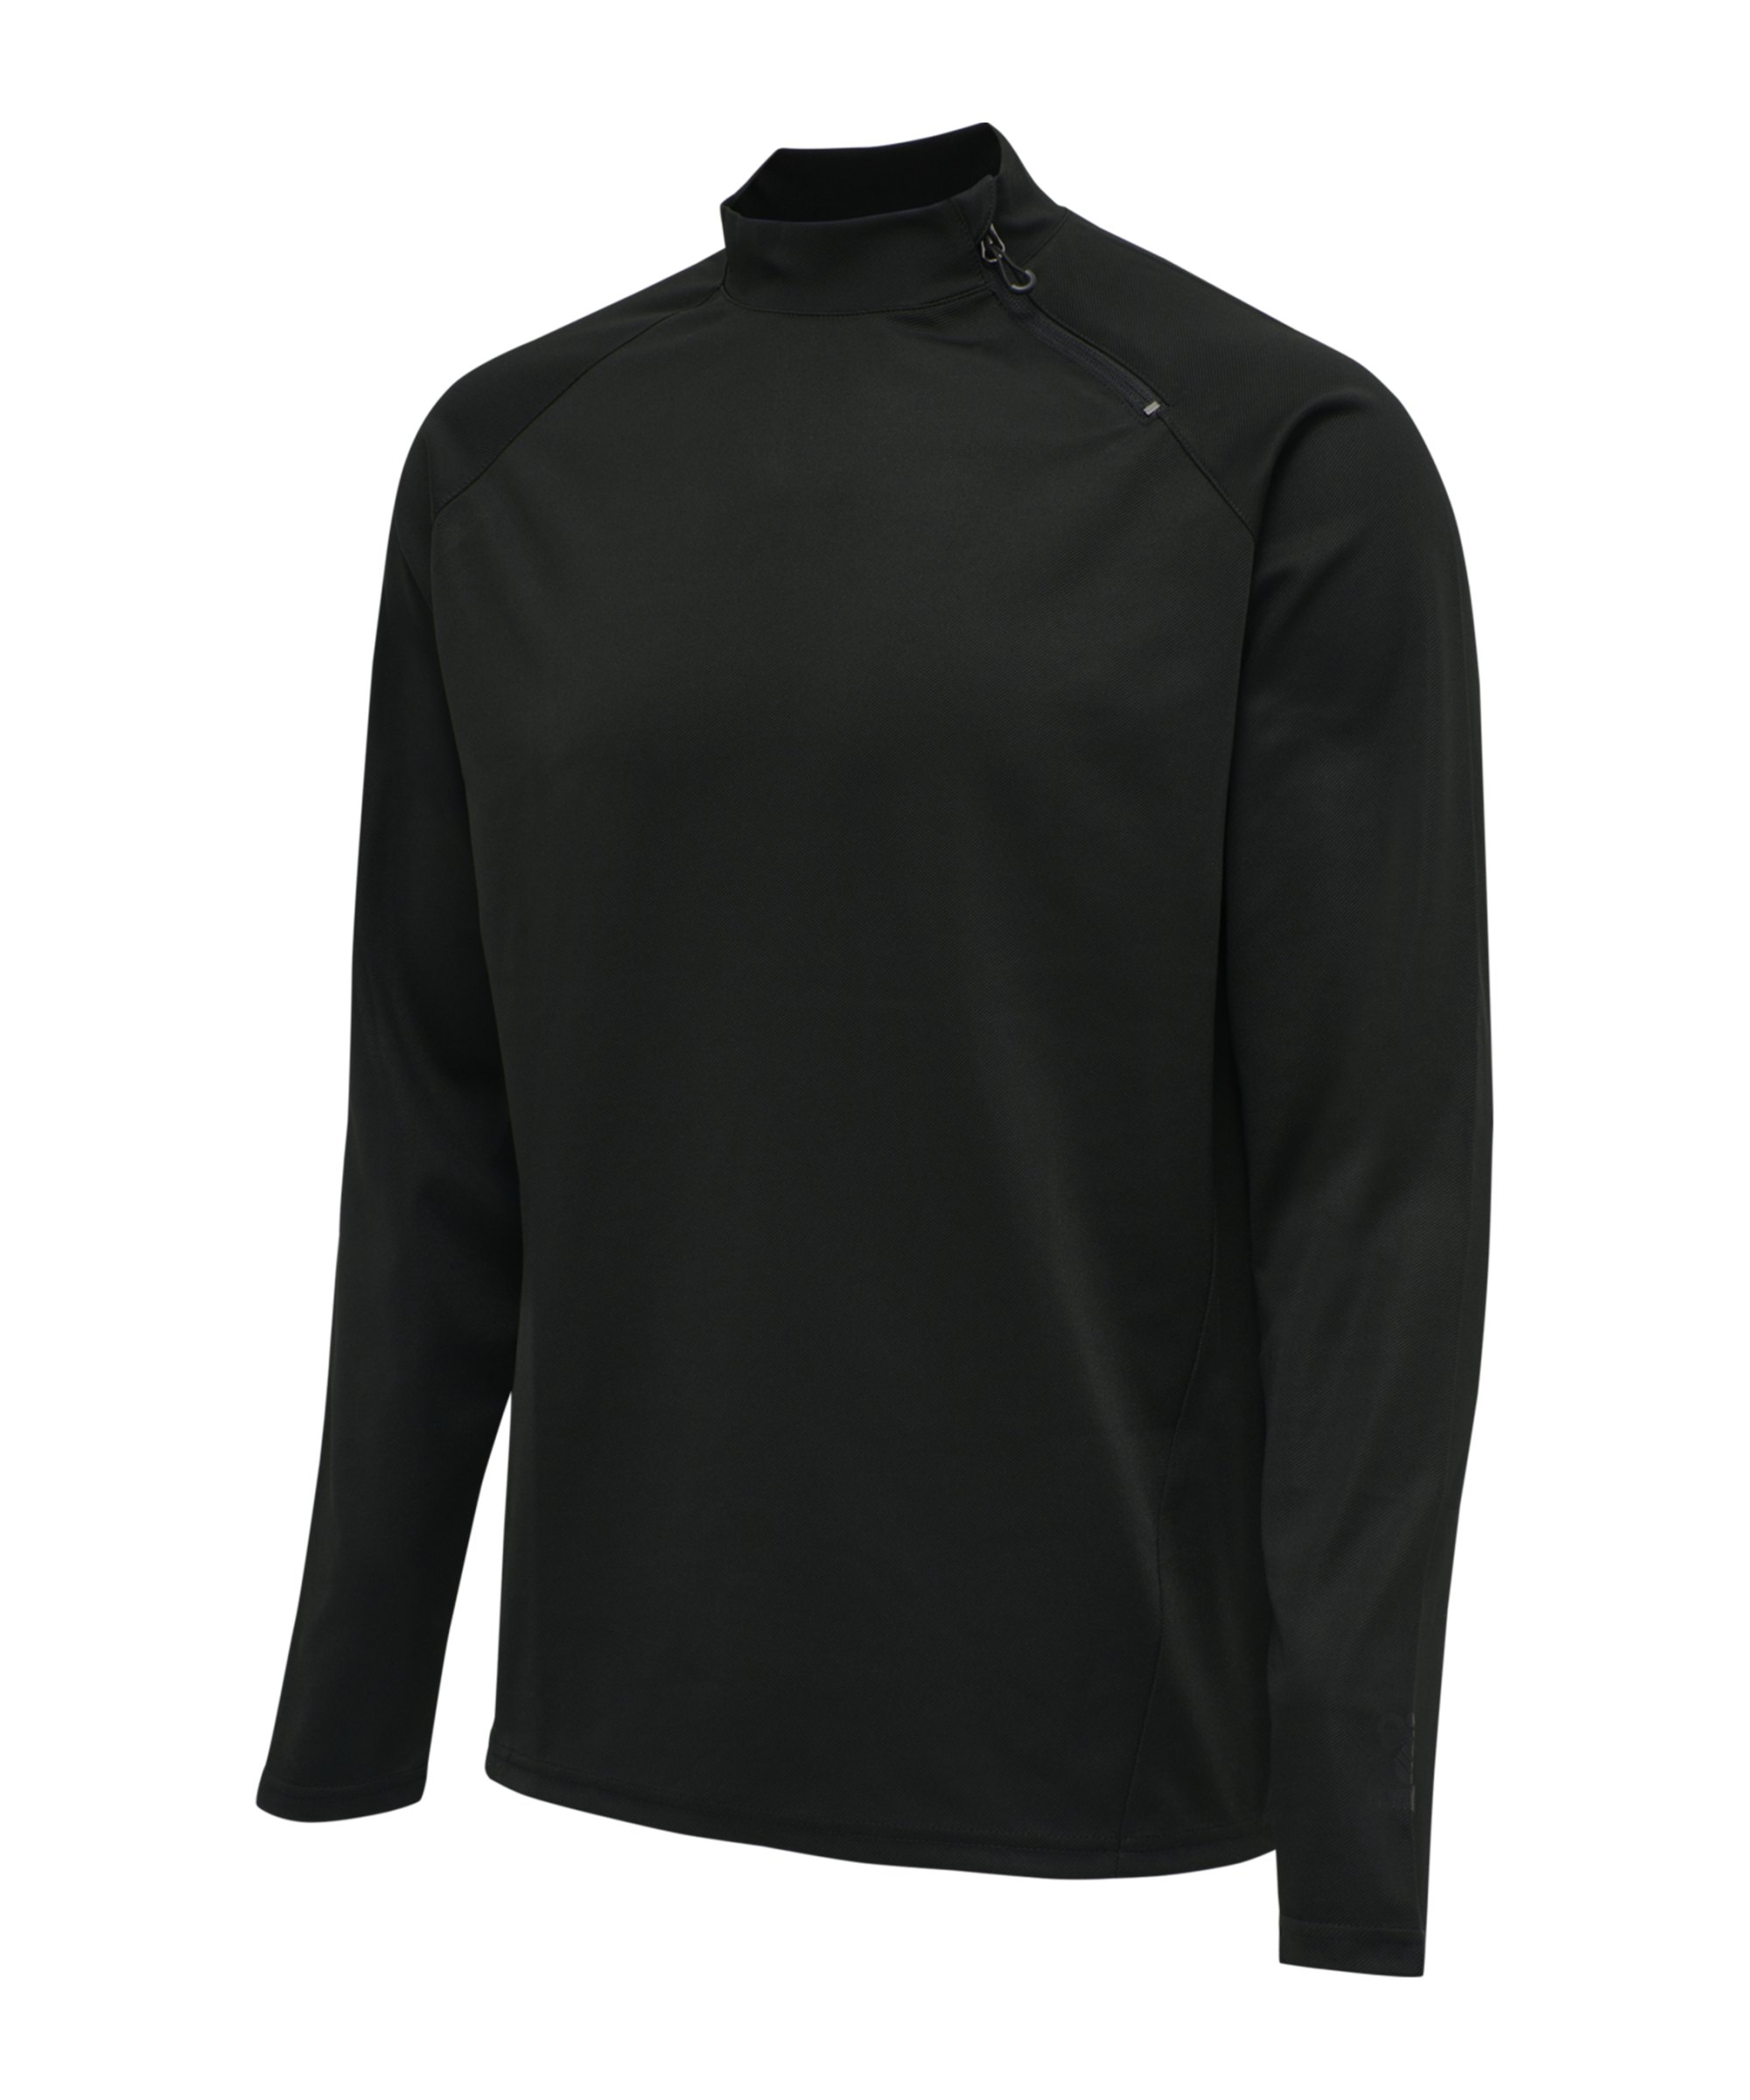 Hummel ACTION HalfZip Sweatshirt Schwarz F2345 - schwarz